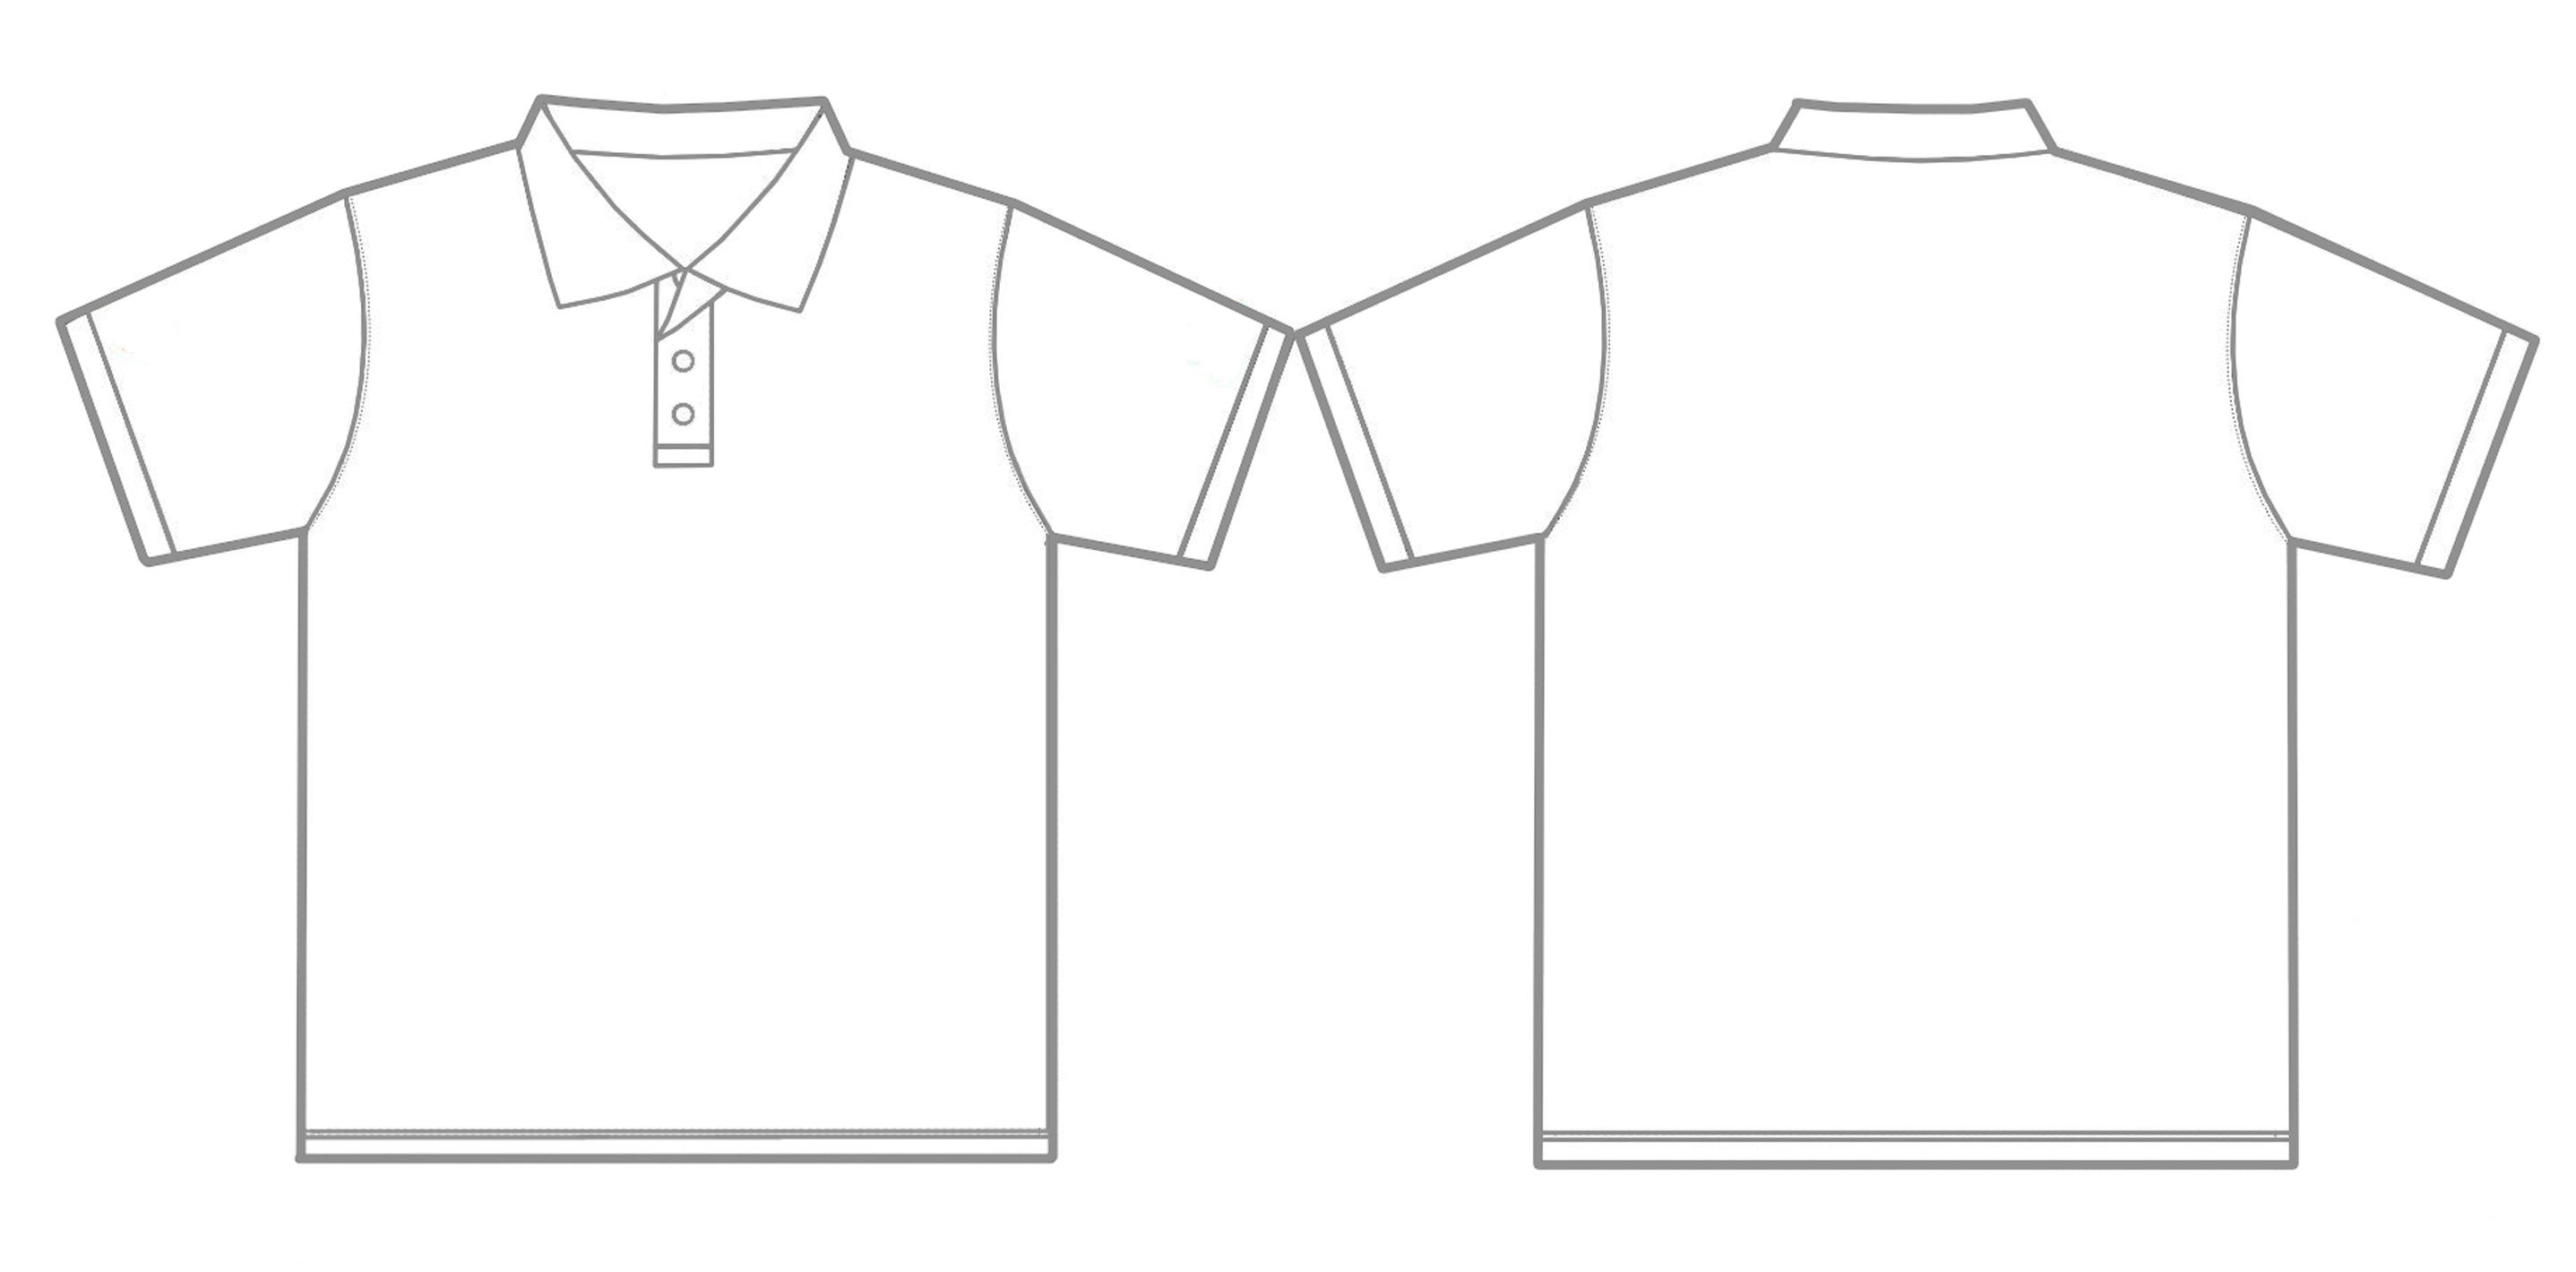 Collar t shirt template clipart svg royalty free stock Free T-shirt Template, Download Free Clip Art, Free Clip Art on ... svg royalty free stock